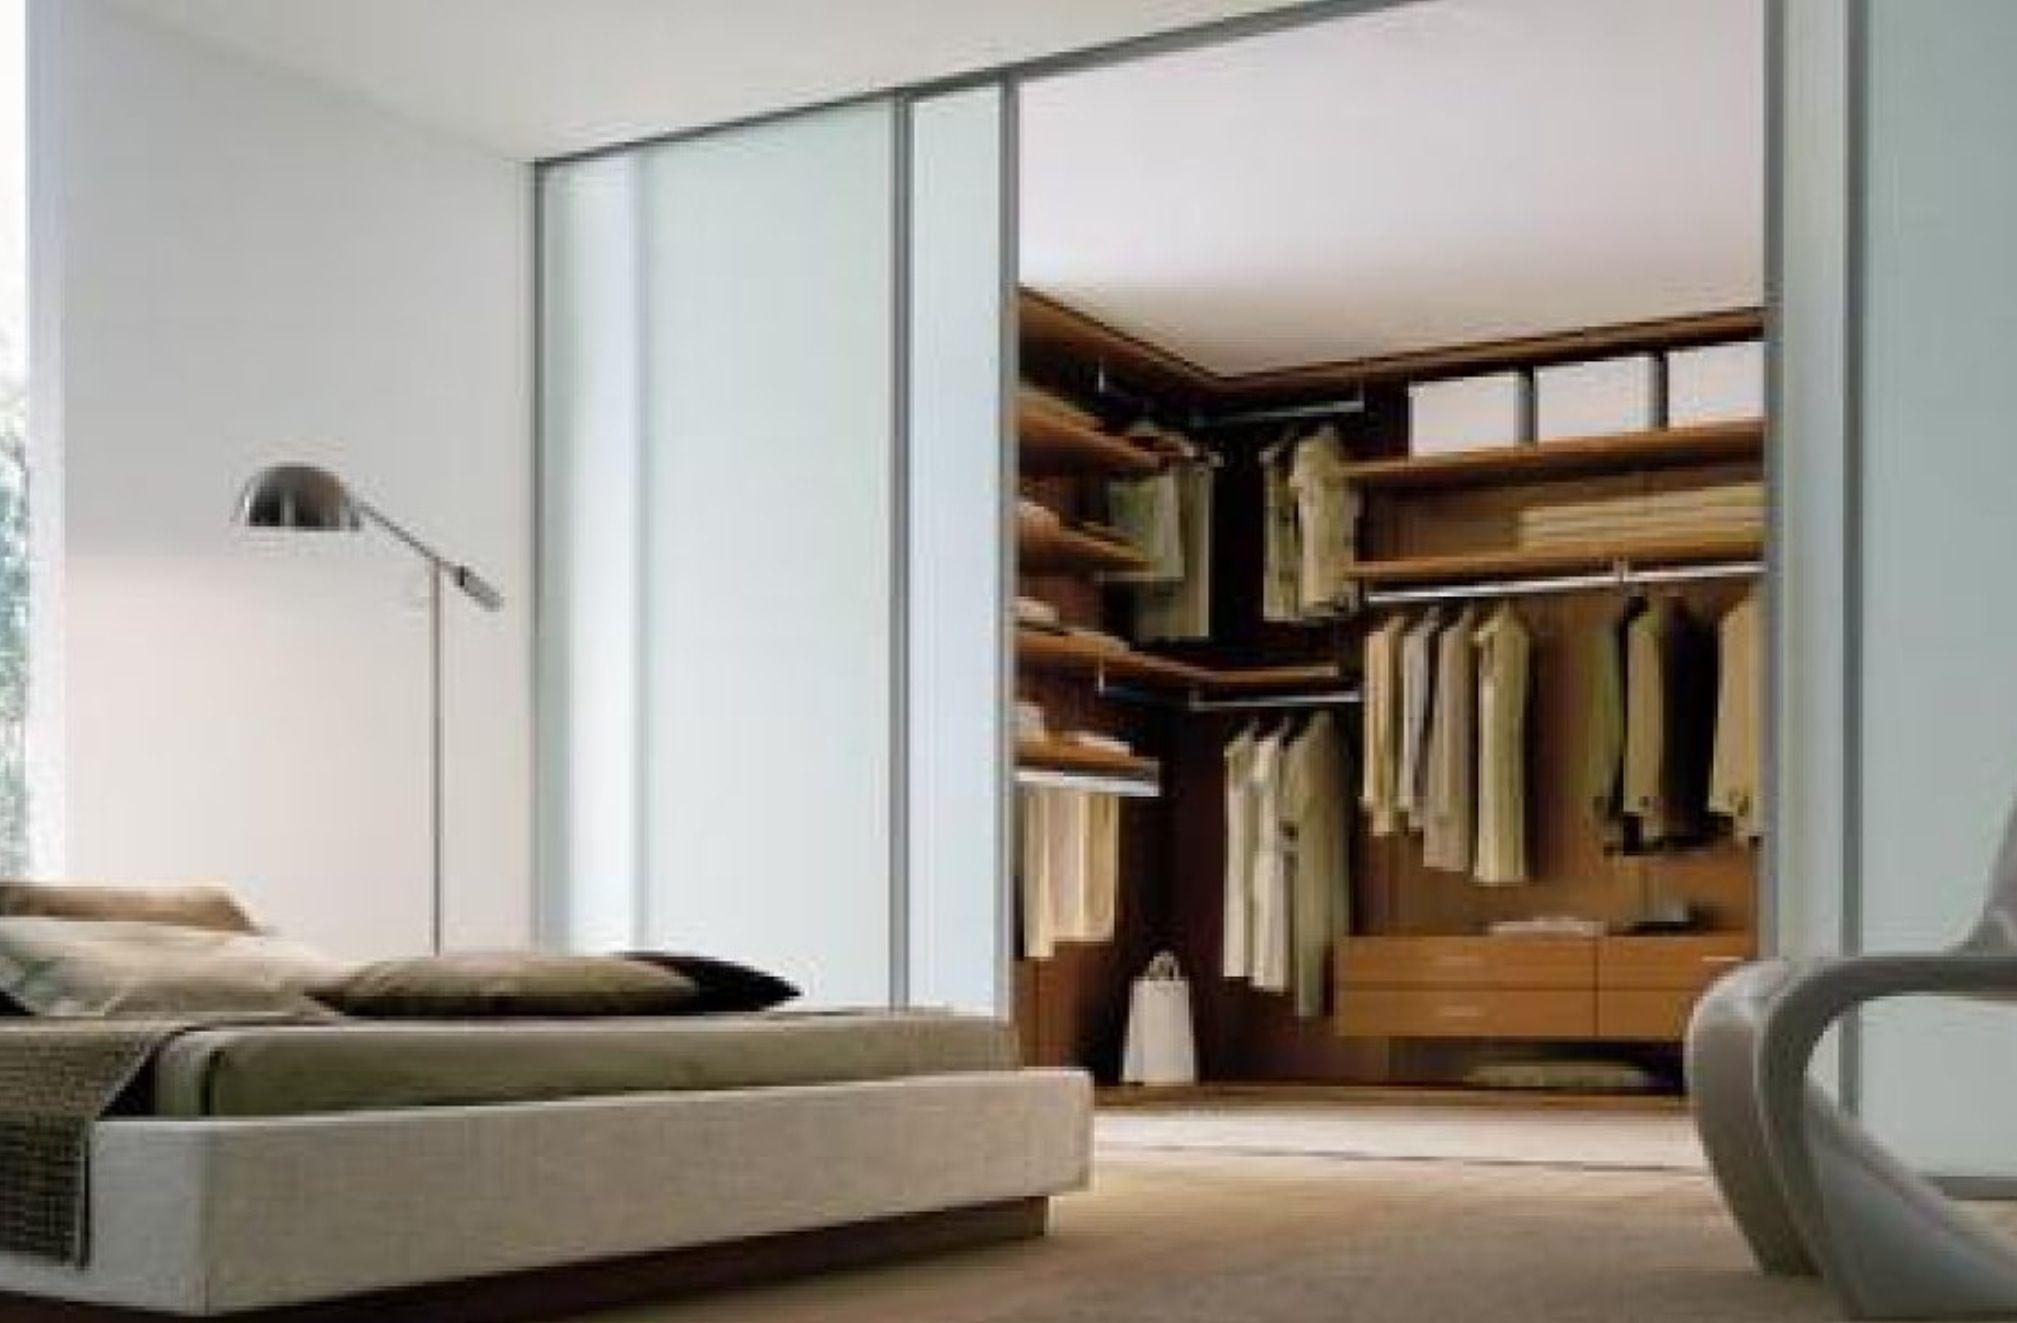 Walk In Closet Dormitorio Pinterest Dormitorio